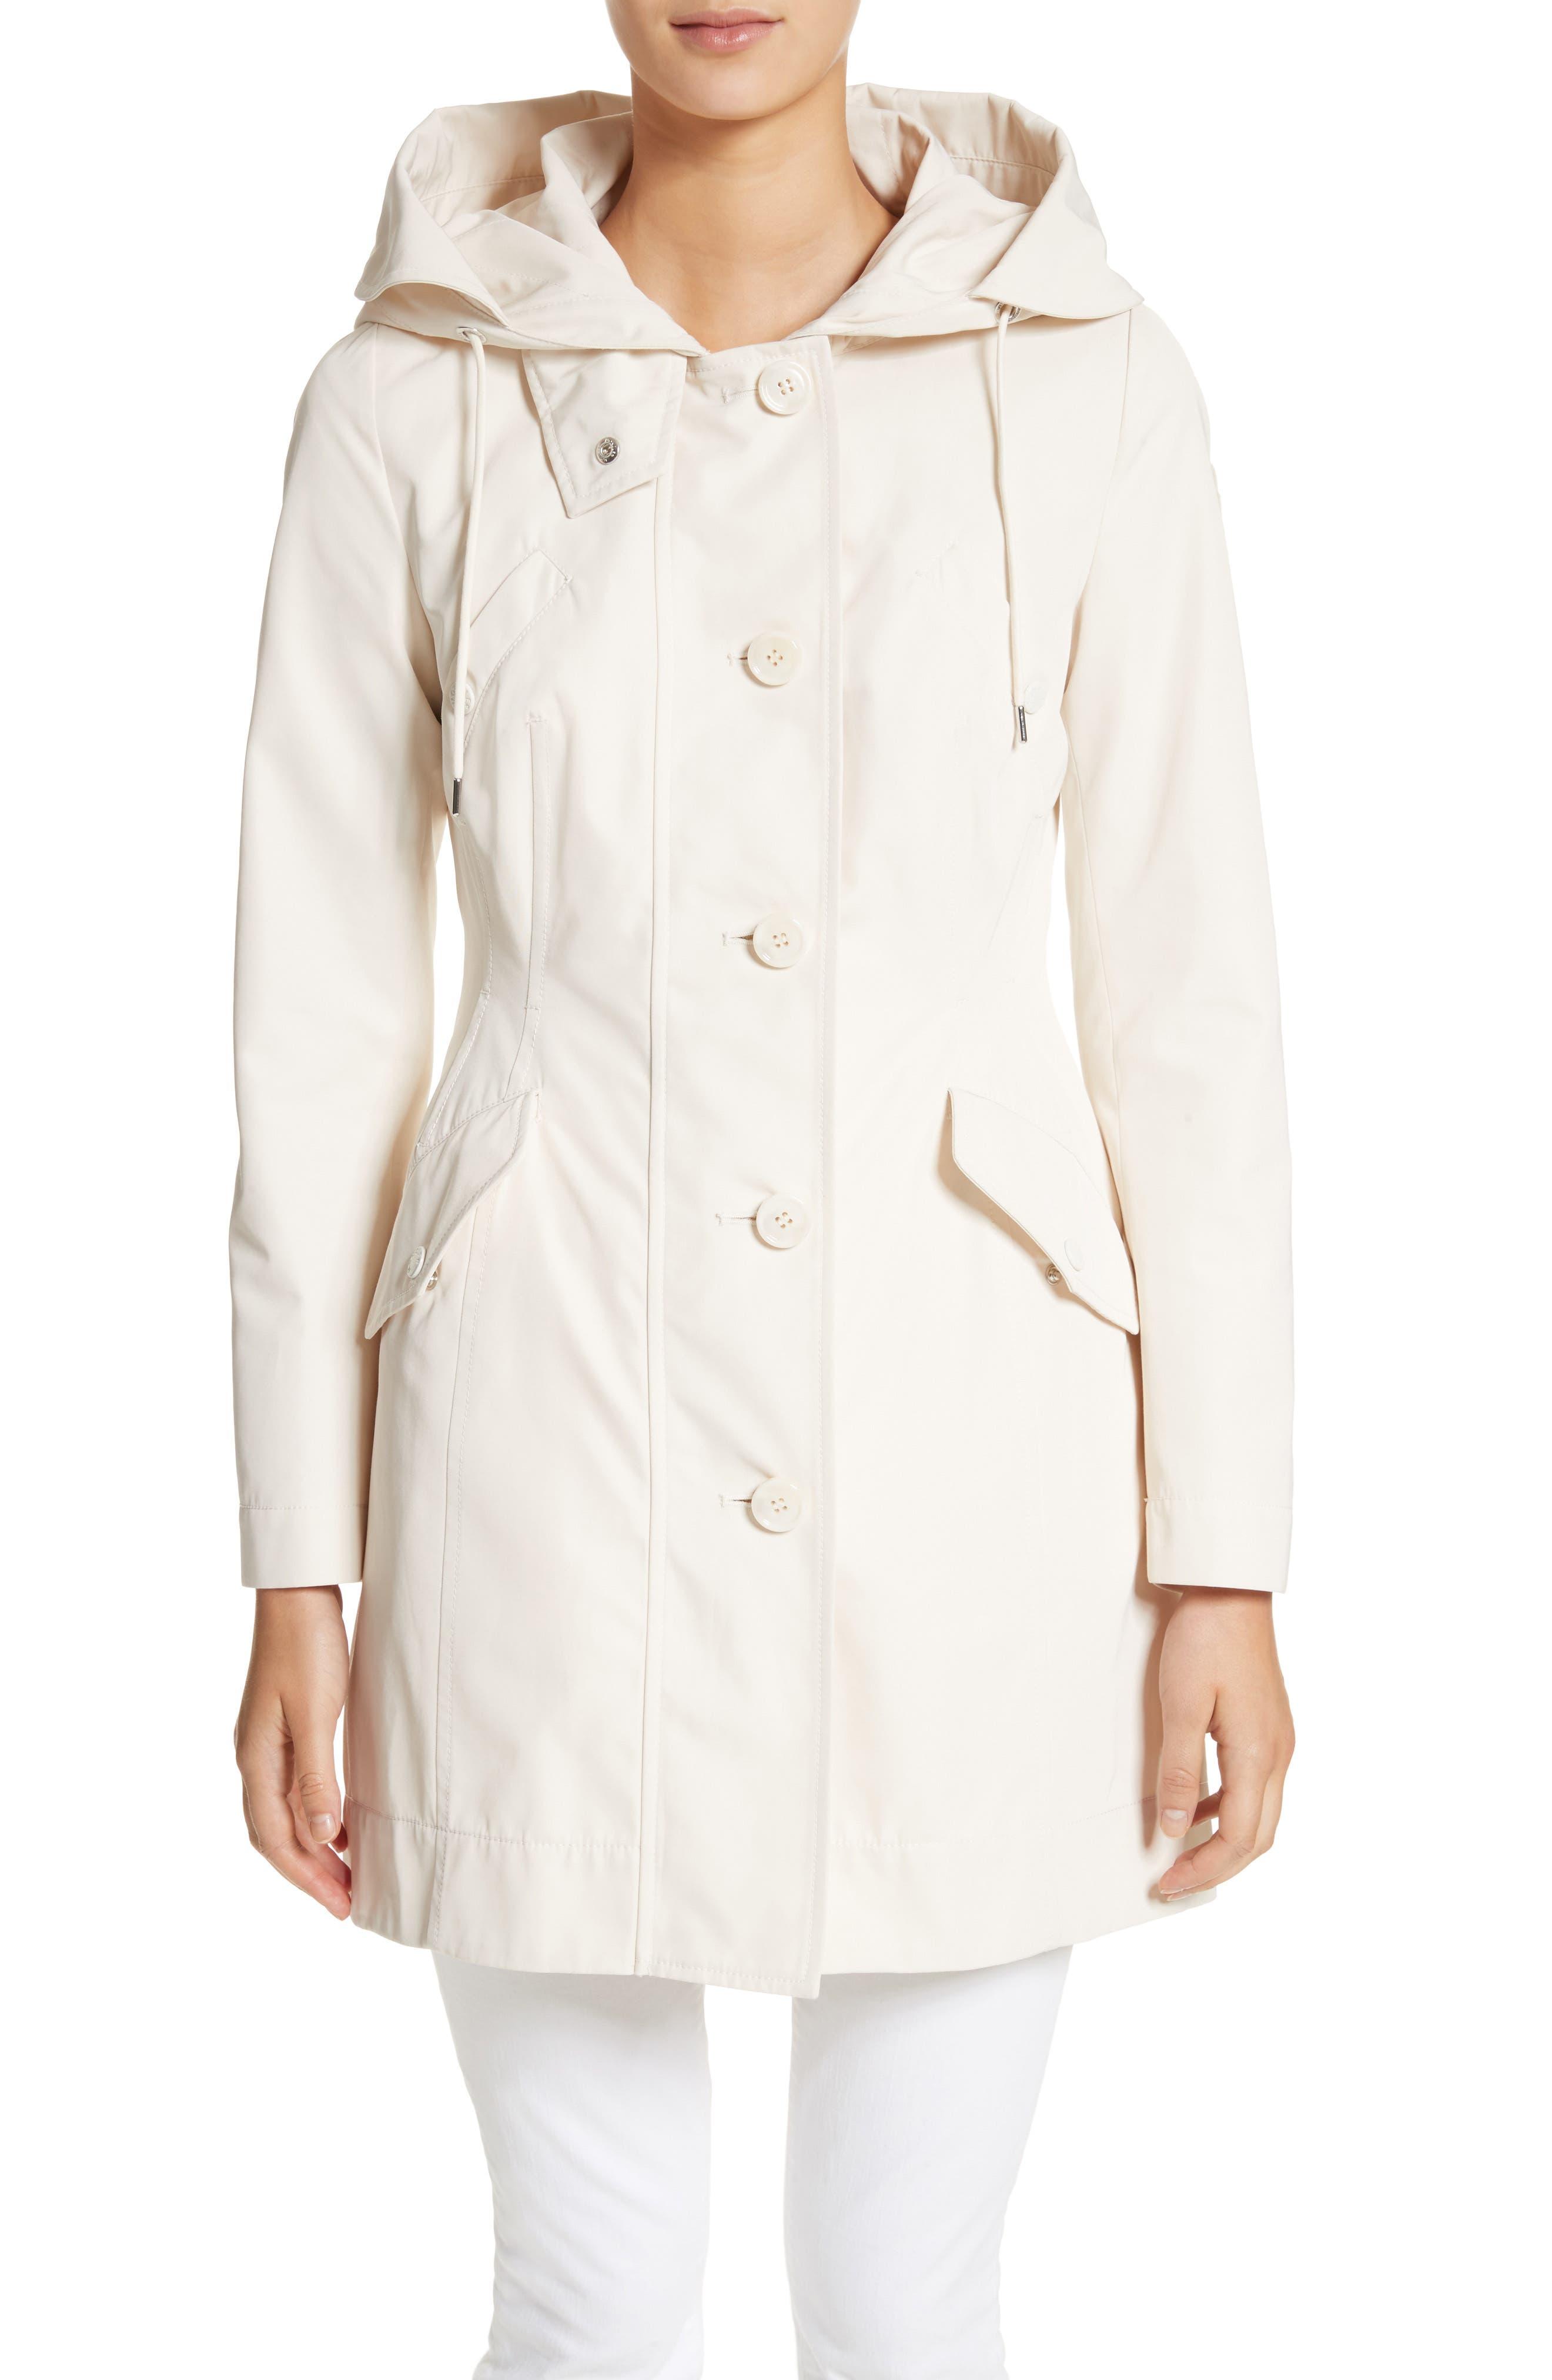 Alternate Image 1 Selected - Moncler Audrey Water Resistant Hooded Raincoat